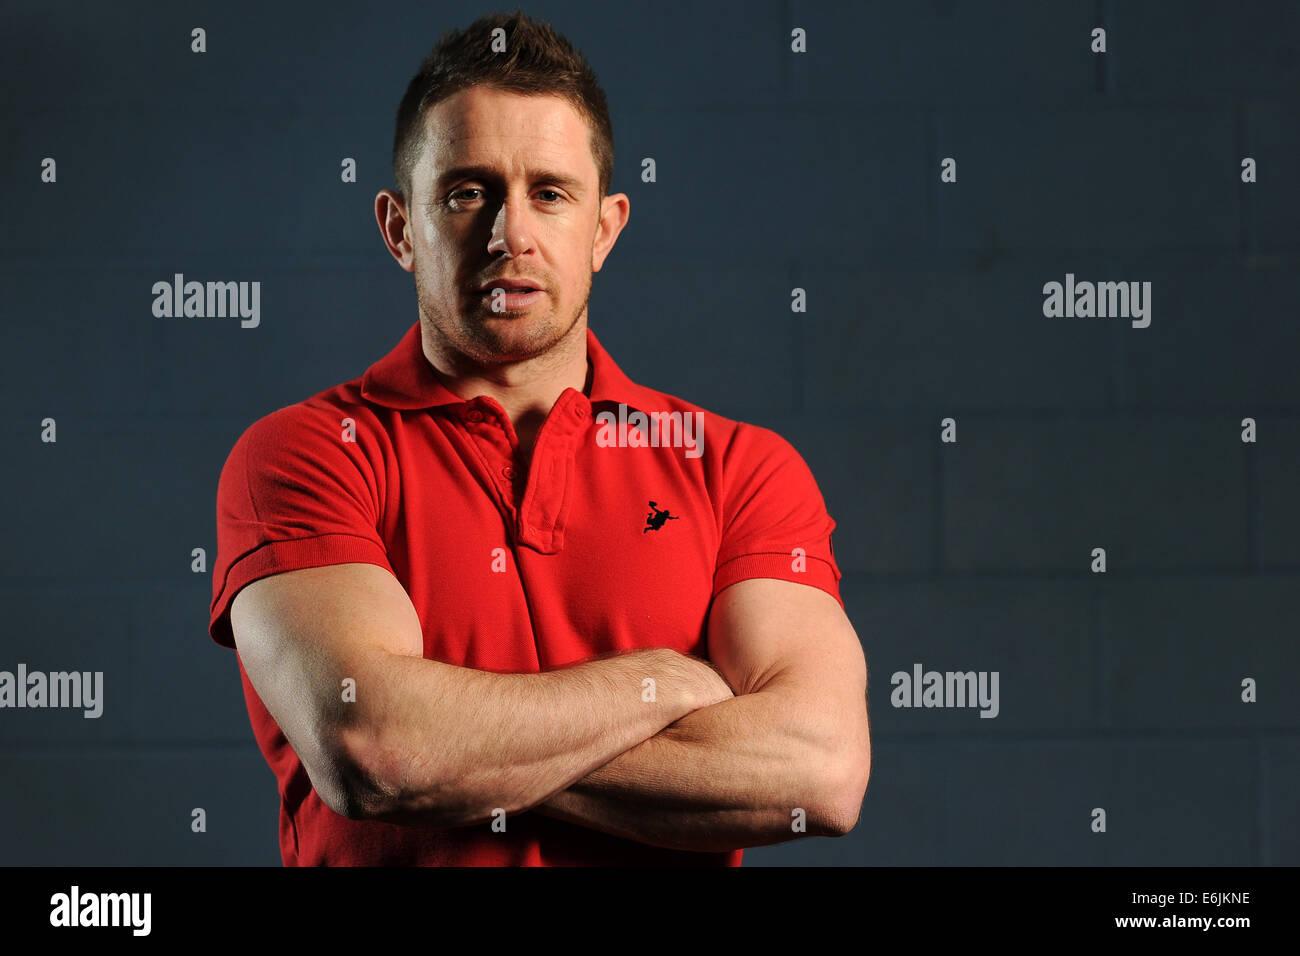 Ex Galles Internazionale di Rugby Shane Williams. Immagini Stock